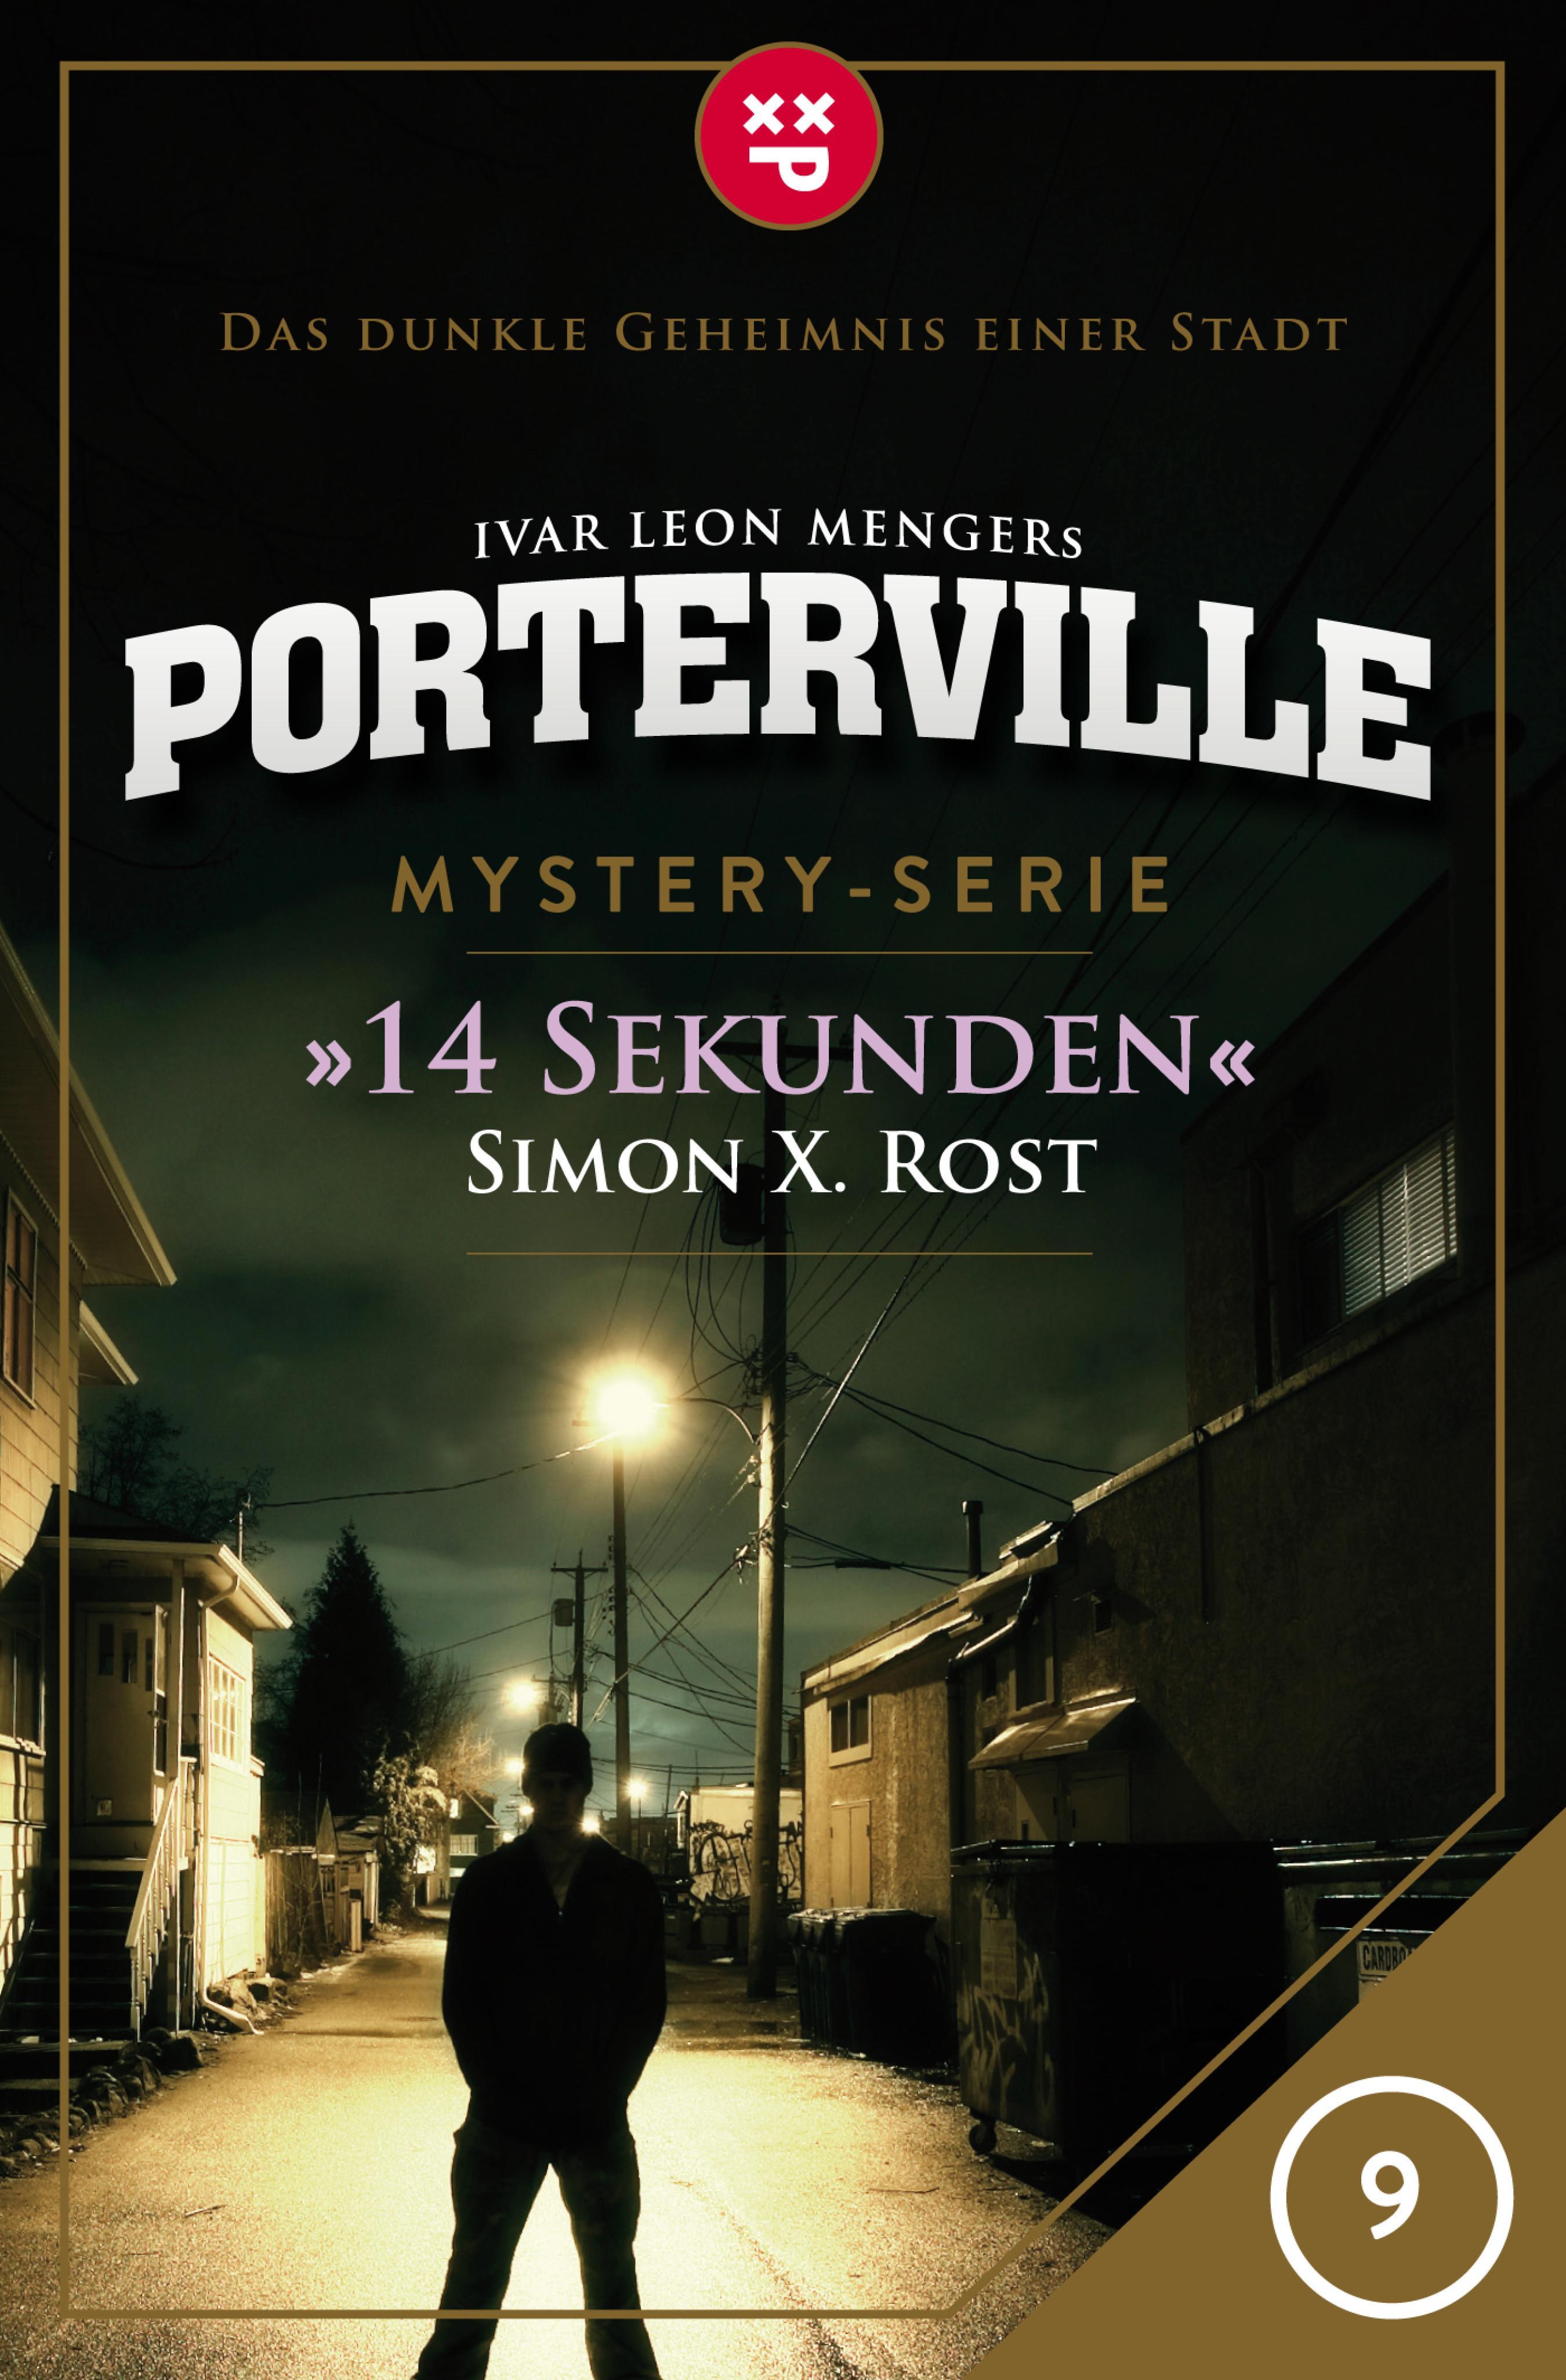 Simon X. Rost Porterville - Folge 09: 14 Sekunden obzor kyrsa bitkoina otvesnyi rost 22 11 2017